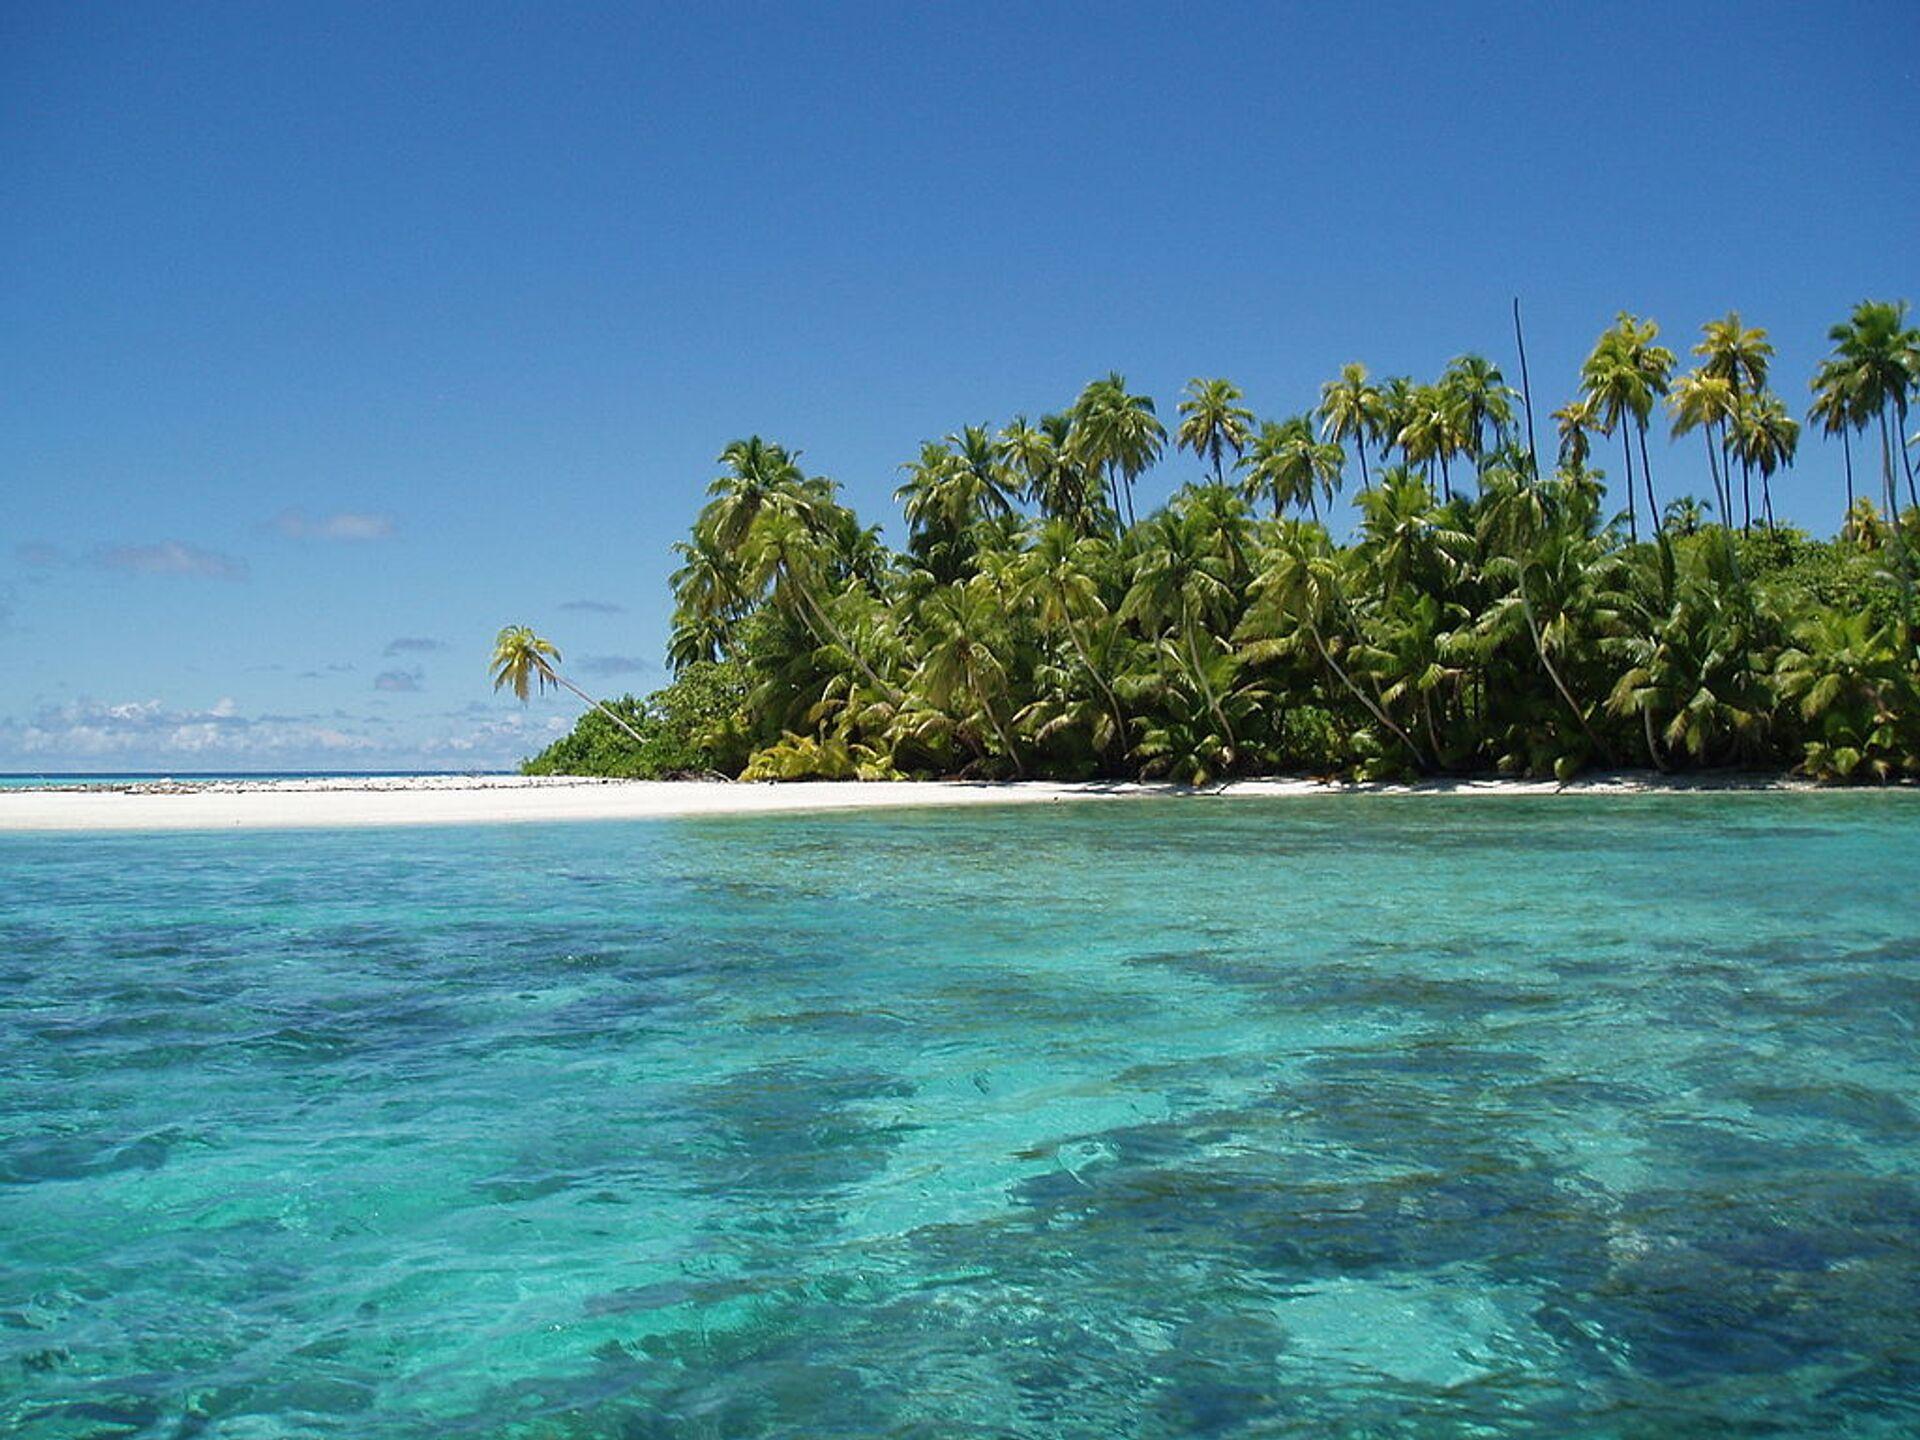 Salomons Atoll in the Chagos - Sputnik International, 1920, 07.09.2021